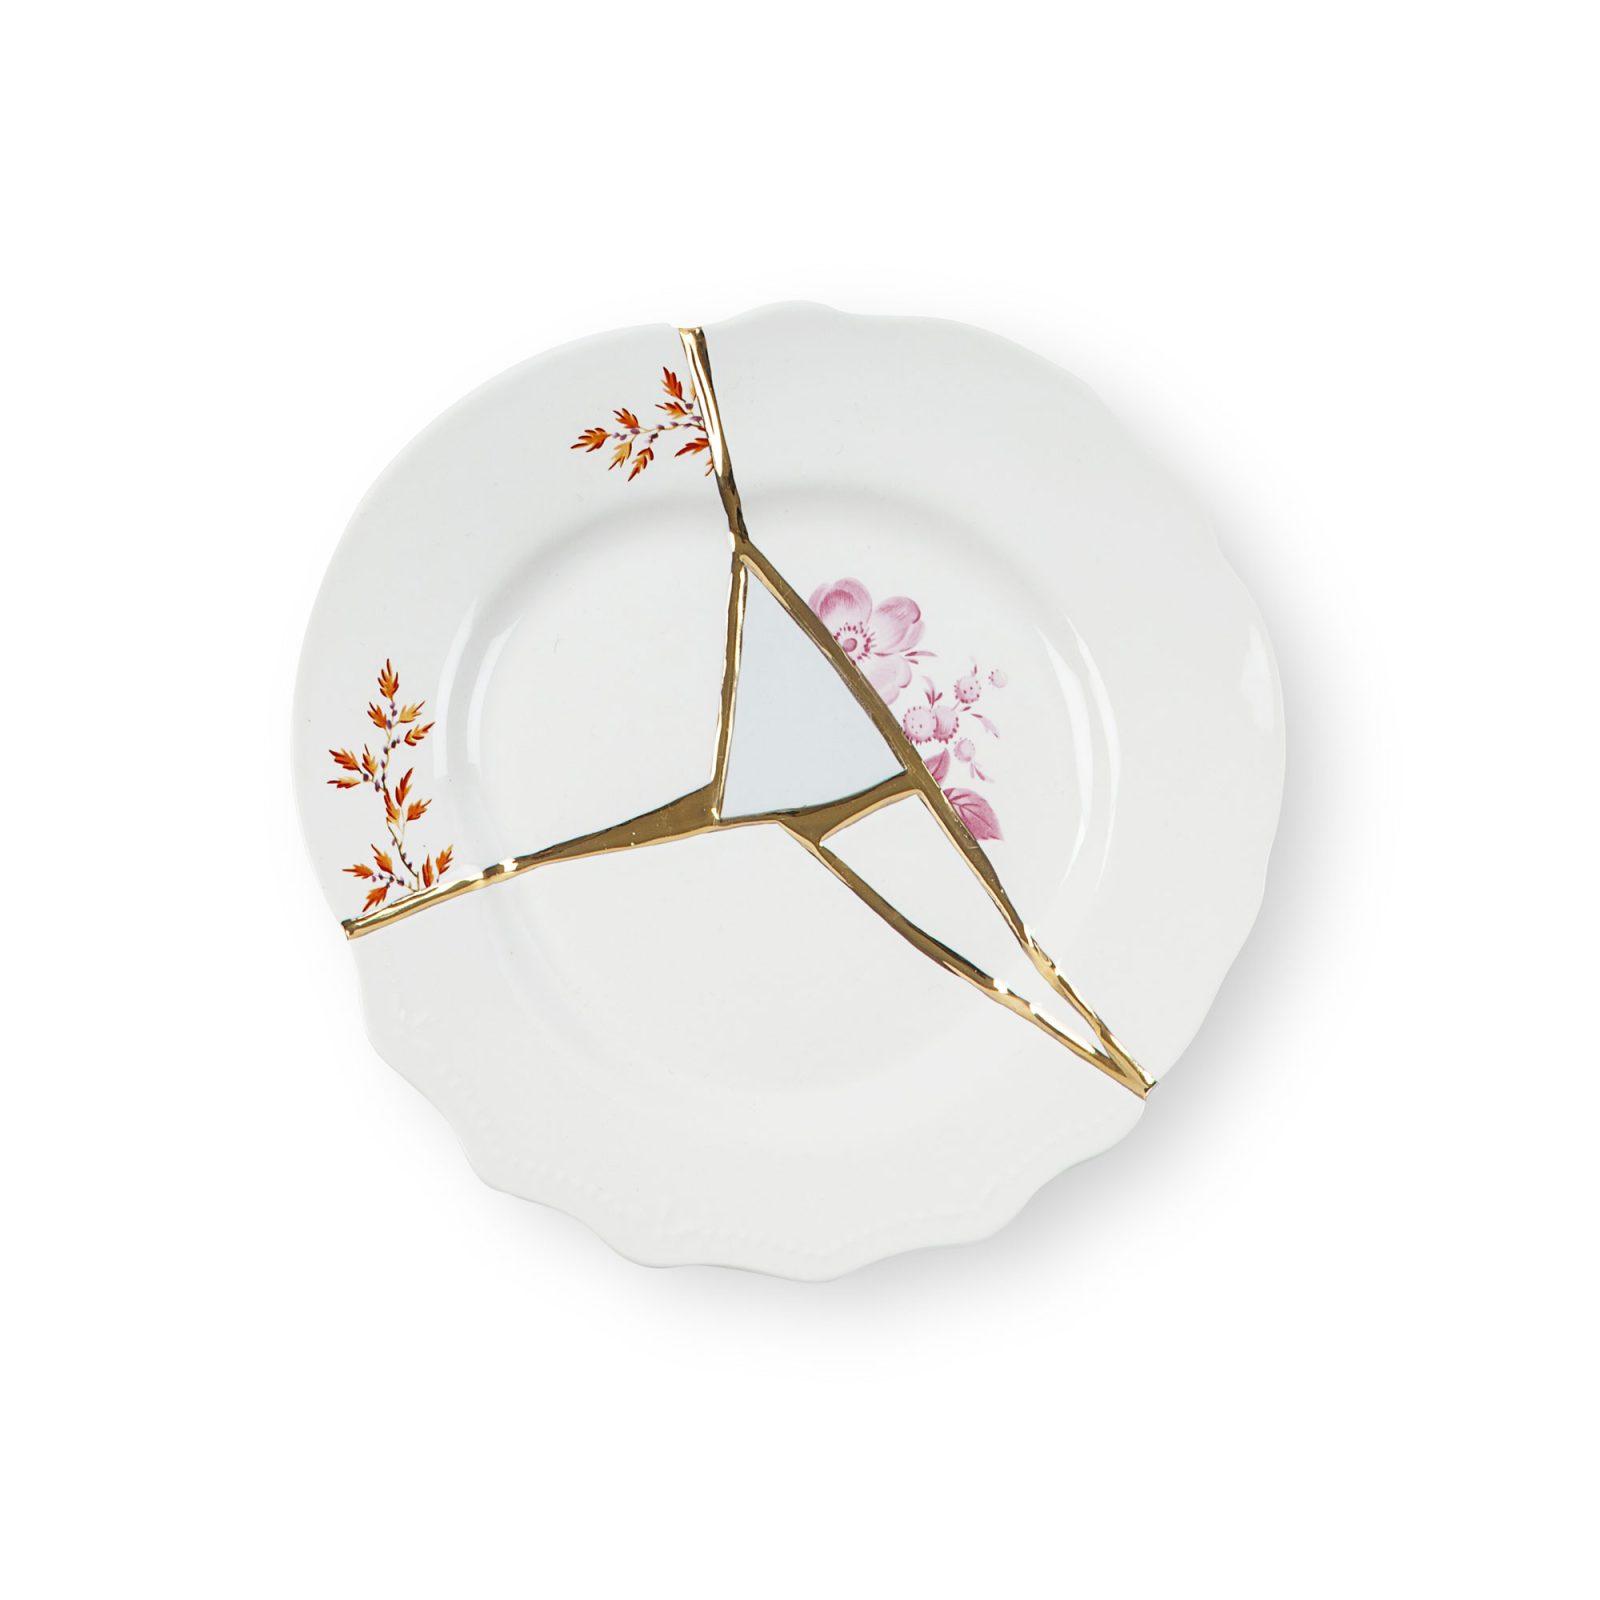 kintsugi-fruit-plate-1-3